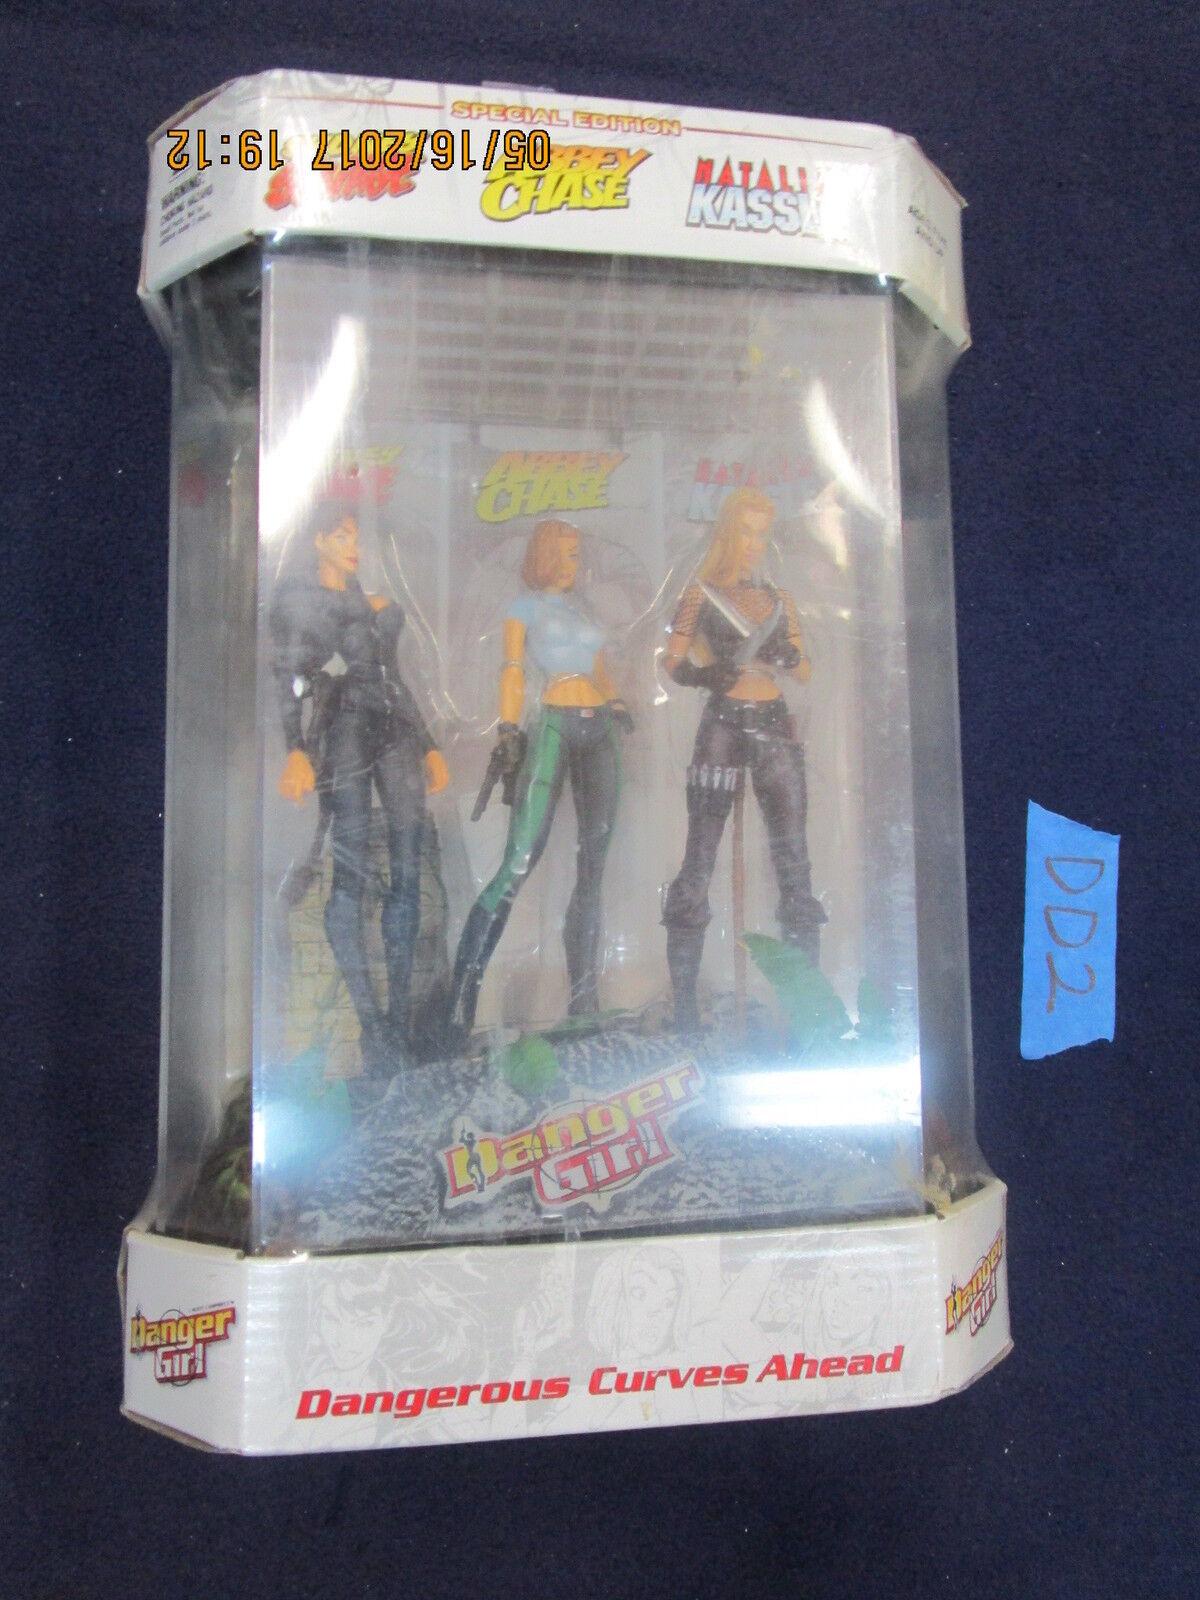 DD2 McFarlane Toys Lot DANGER GIRL SET Sydney Savage Abbey Chase Natalia Kassle